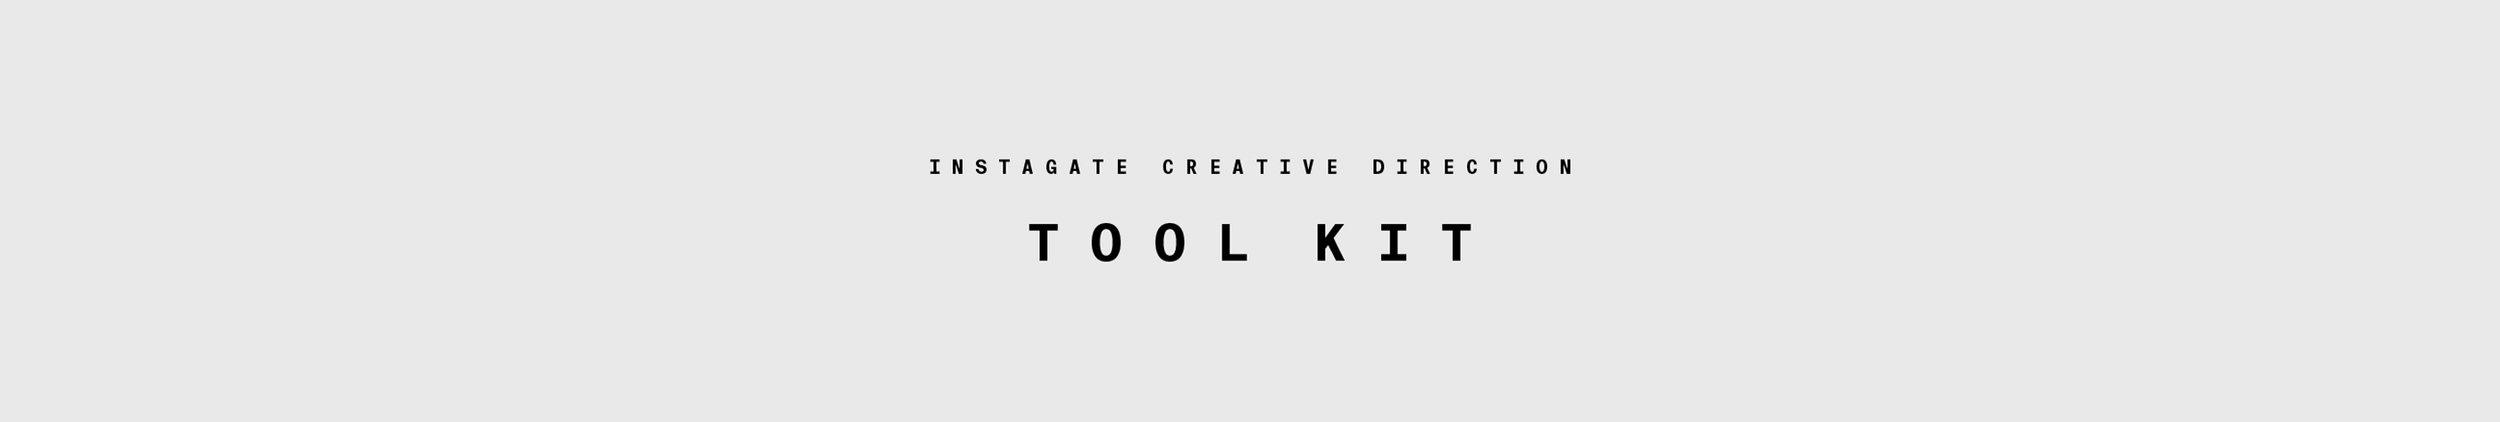 INSTA_DECK-5_tool+kit.jpg